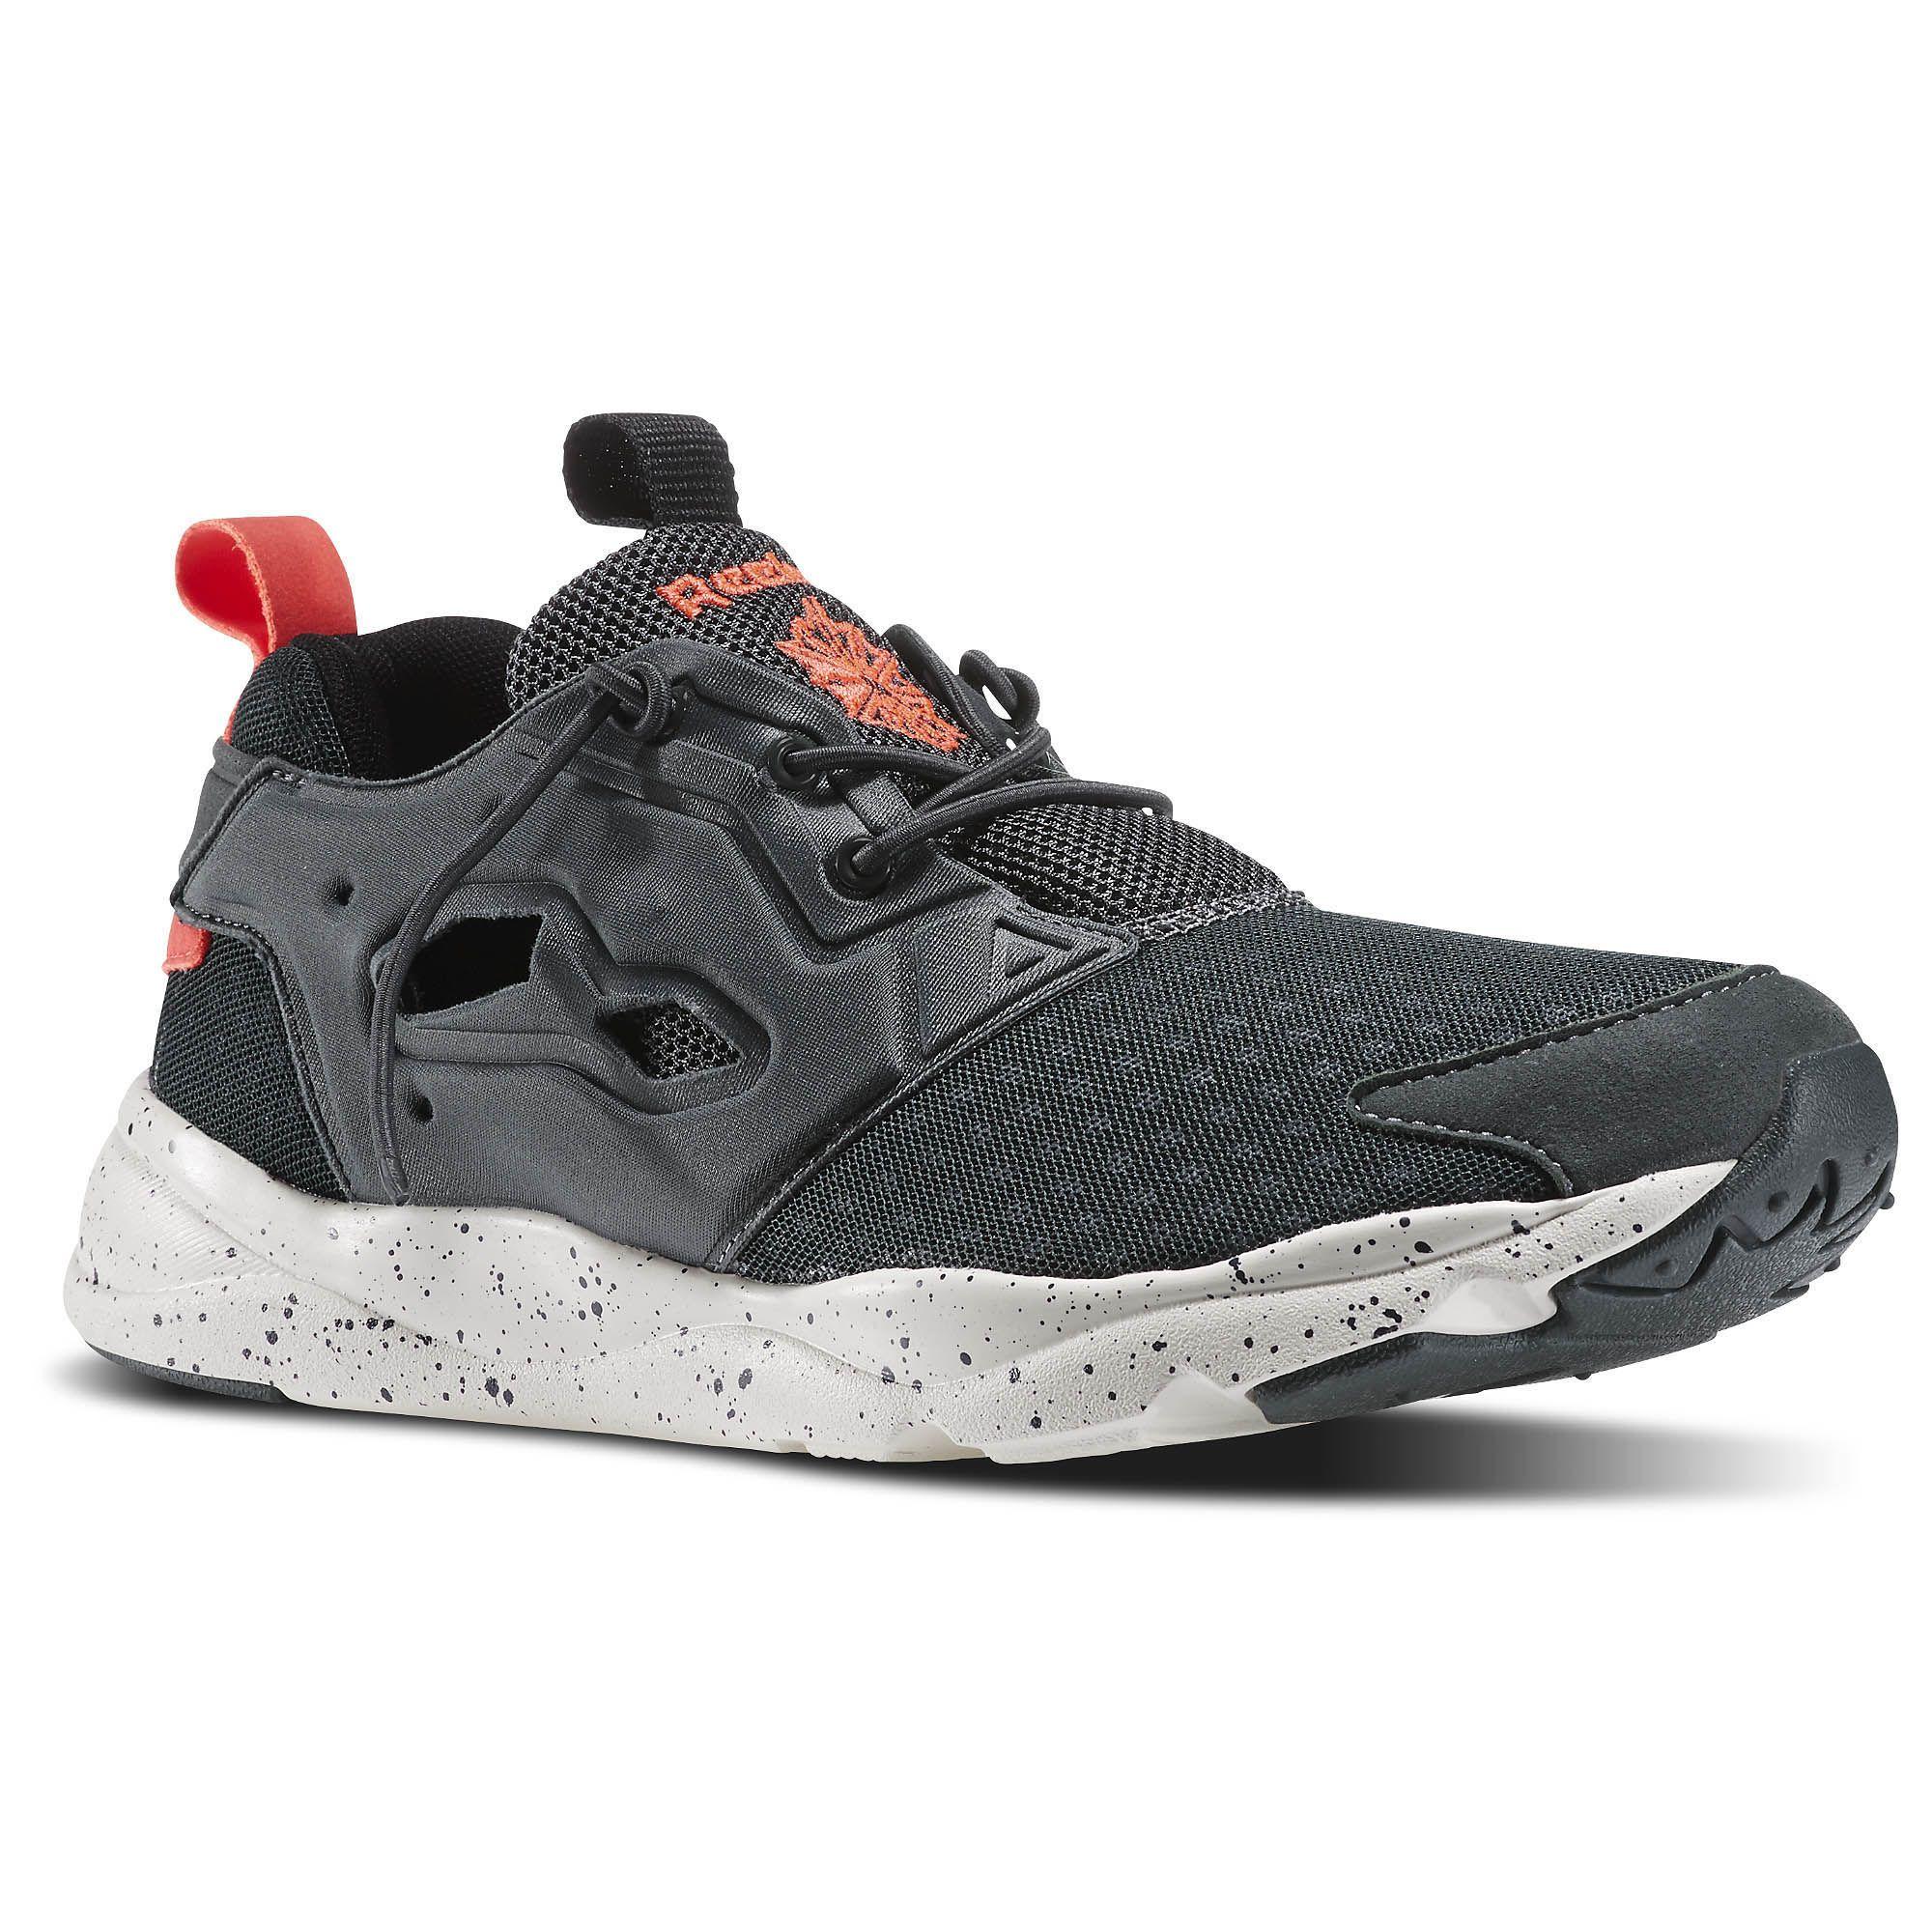 huge selection of 43220 652f8 Nike-休閒鞋-Kwazi-Se-運動-男鞋  shose   Pinterest   Nike